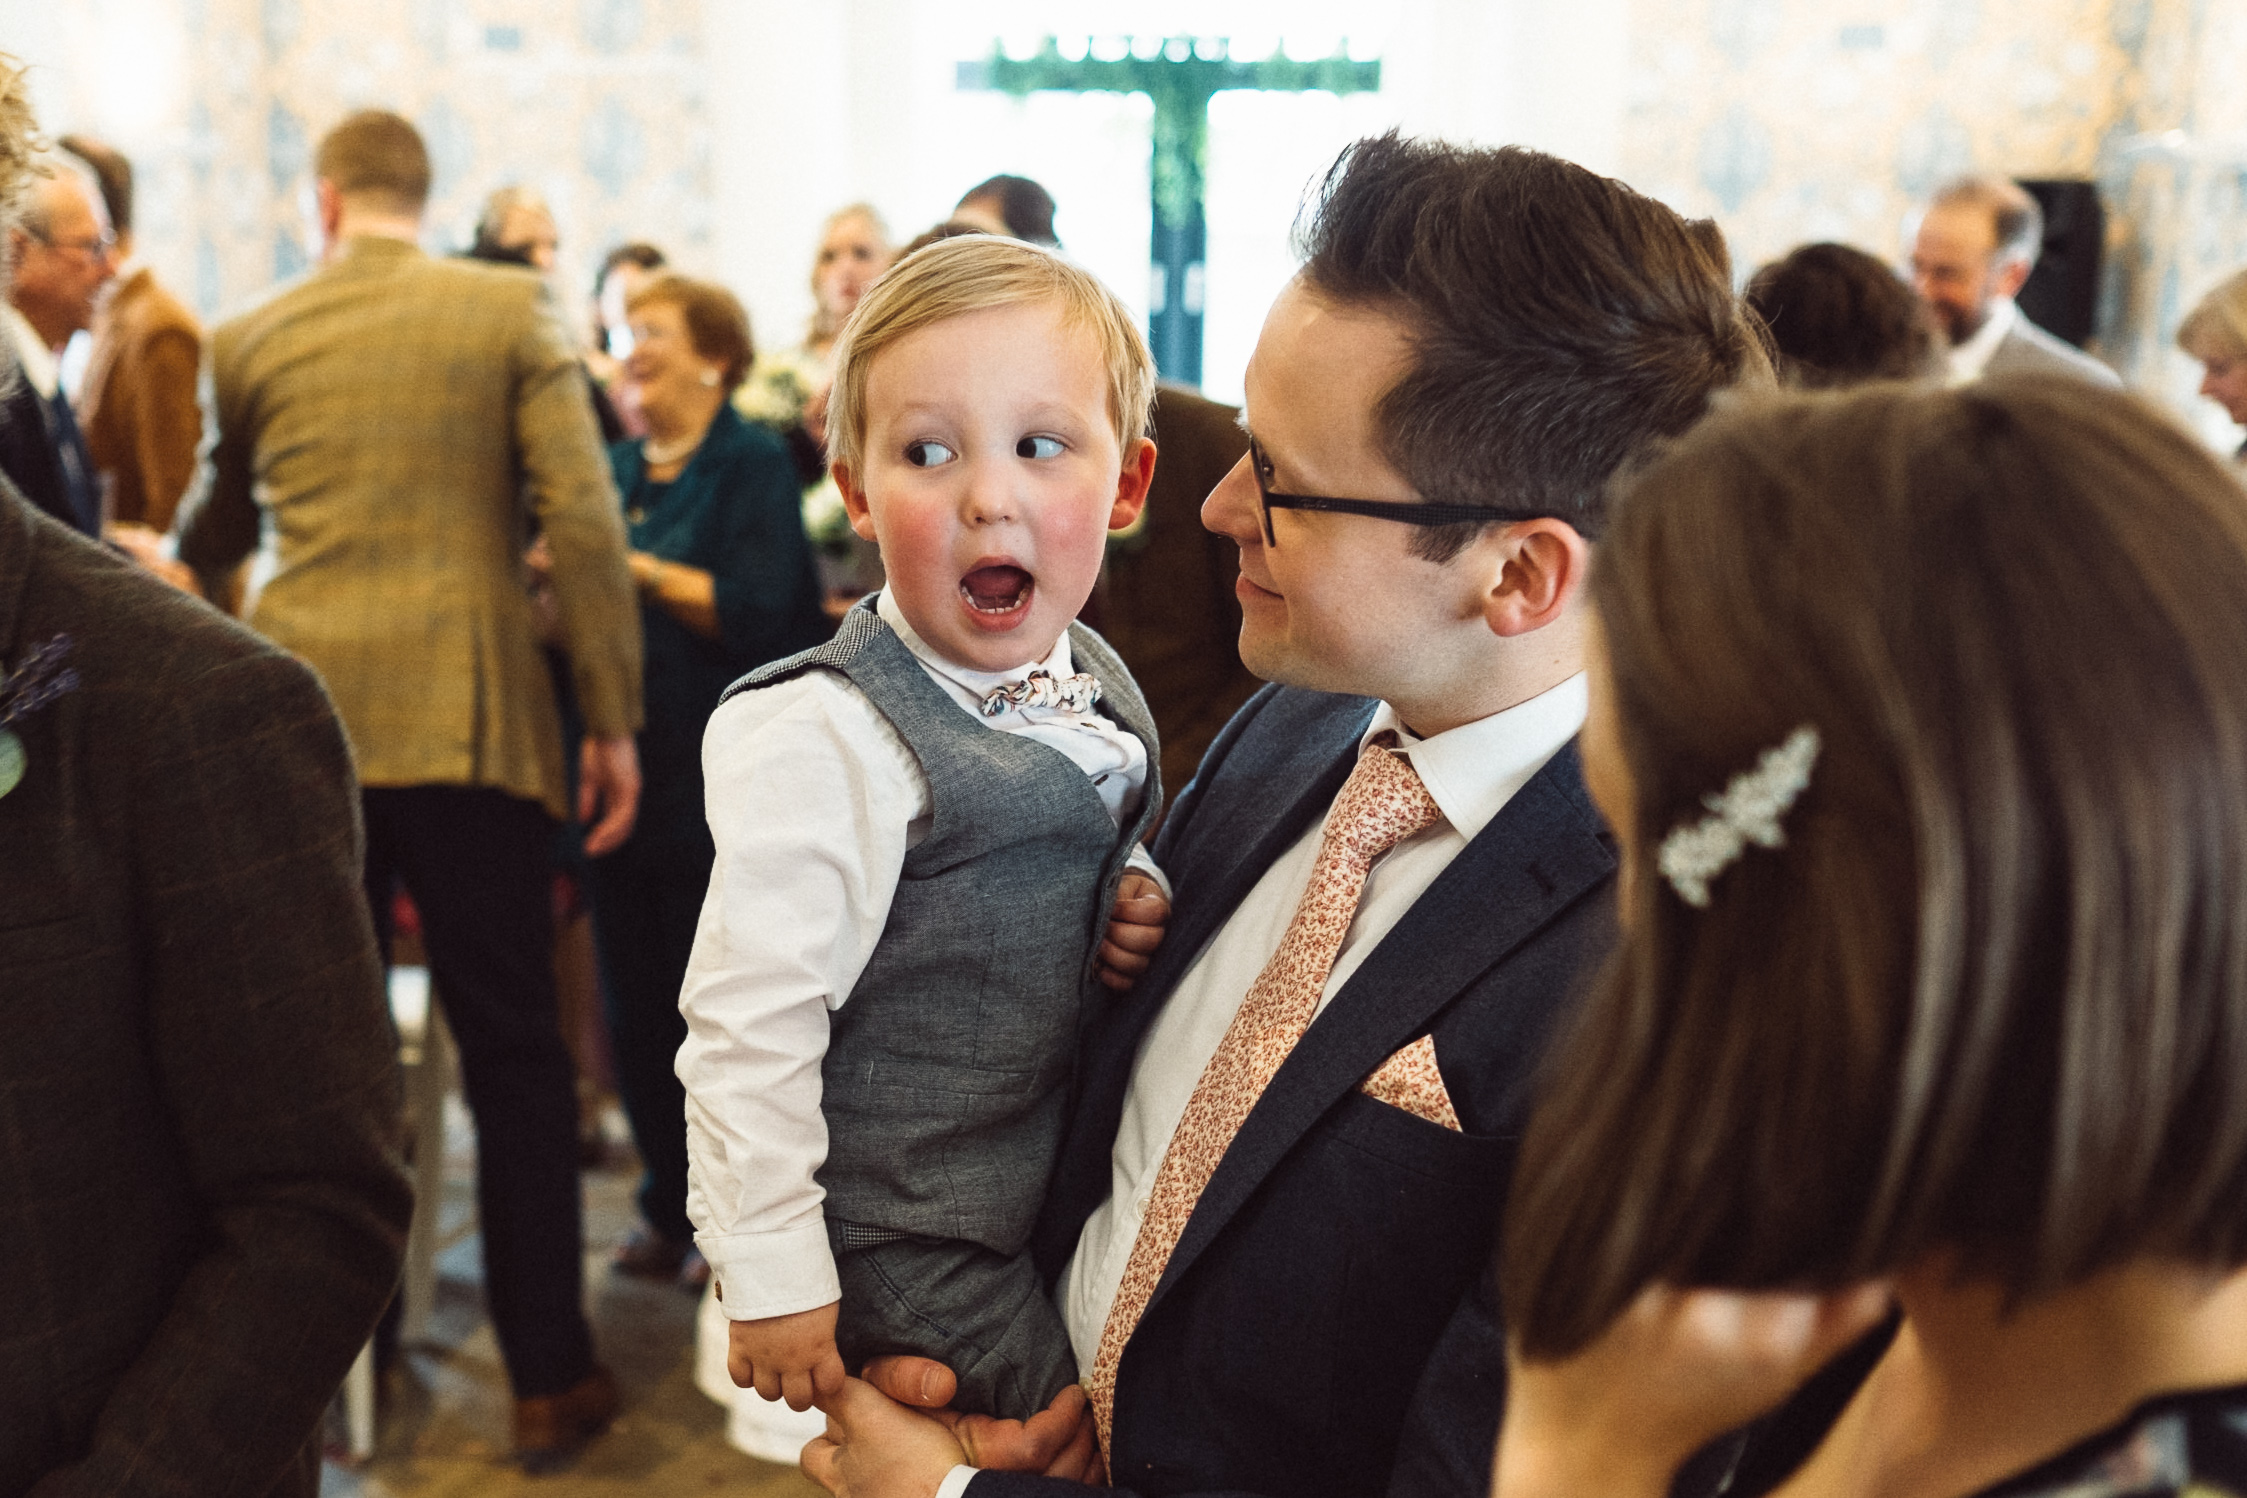 Hereford_wedding_photographer47.jpg